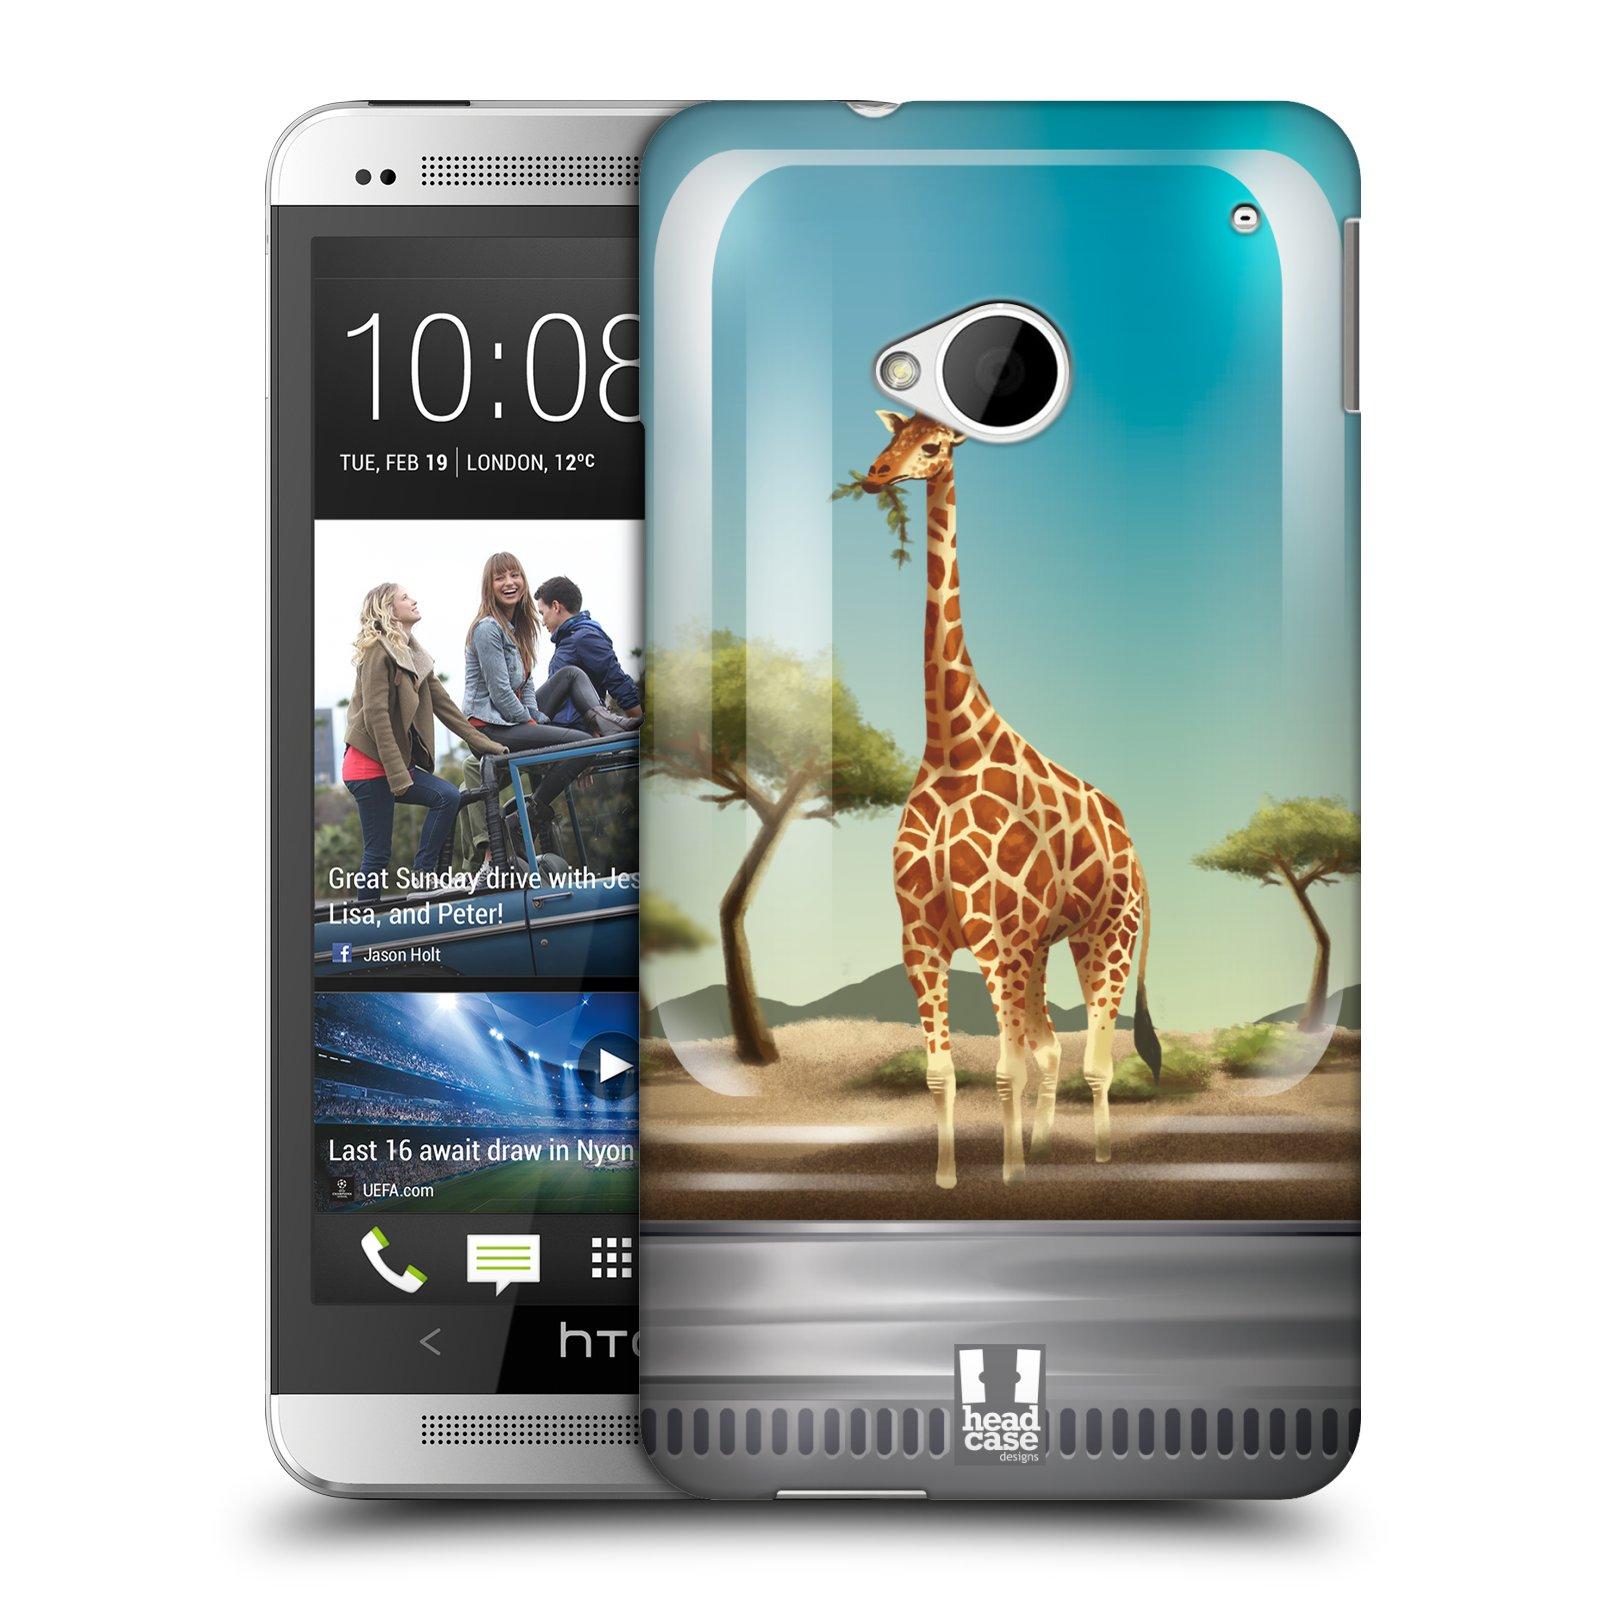 HEAD CASE plastový obal na mobil HTC One (M7) vzor Zvířátka v těžítku žirafa